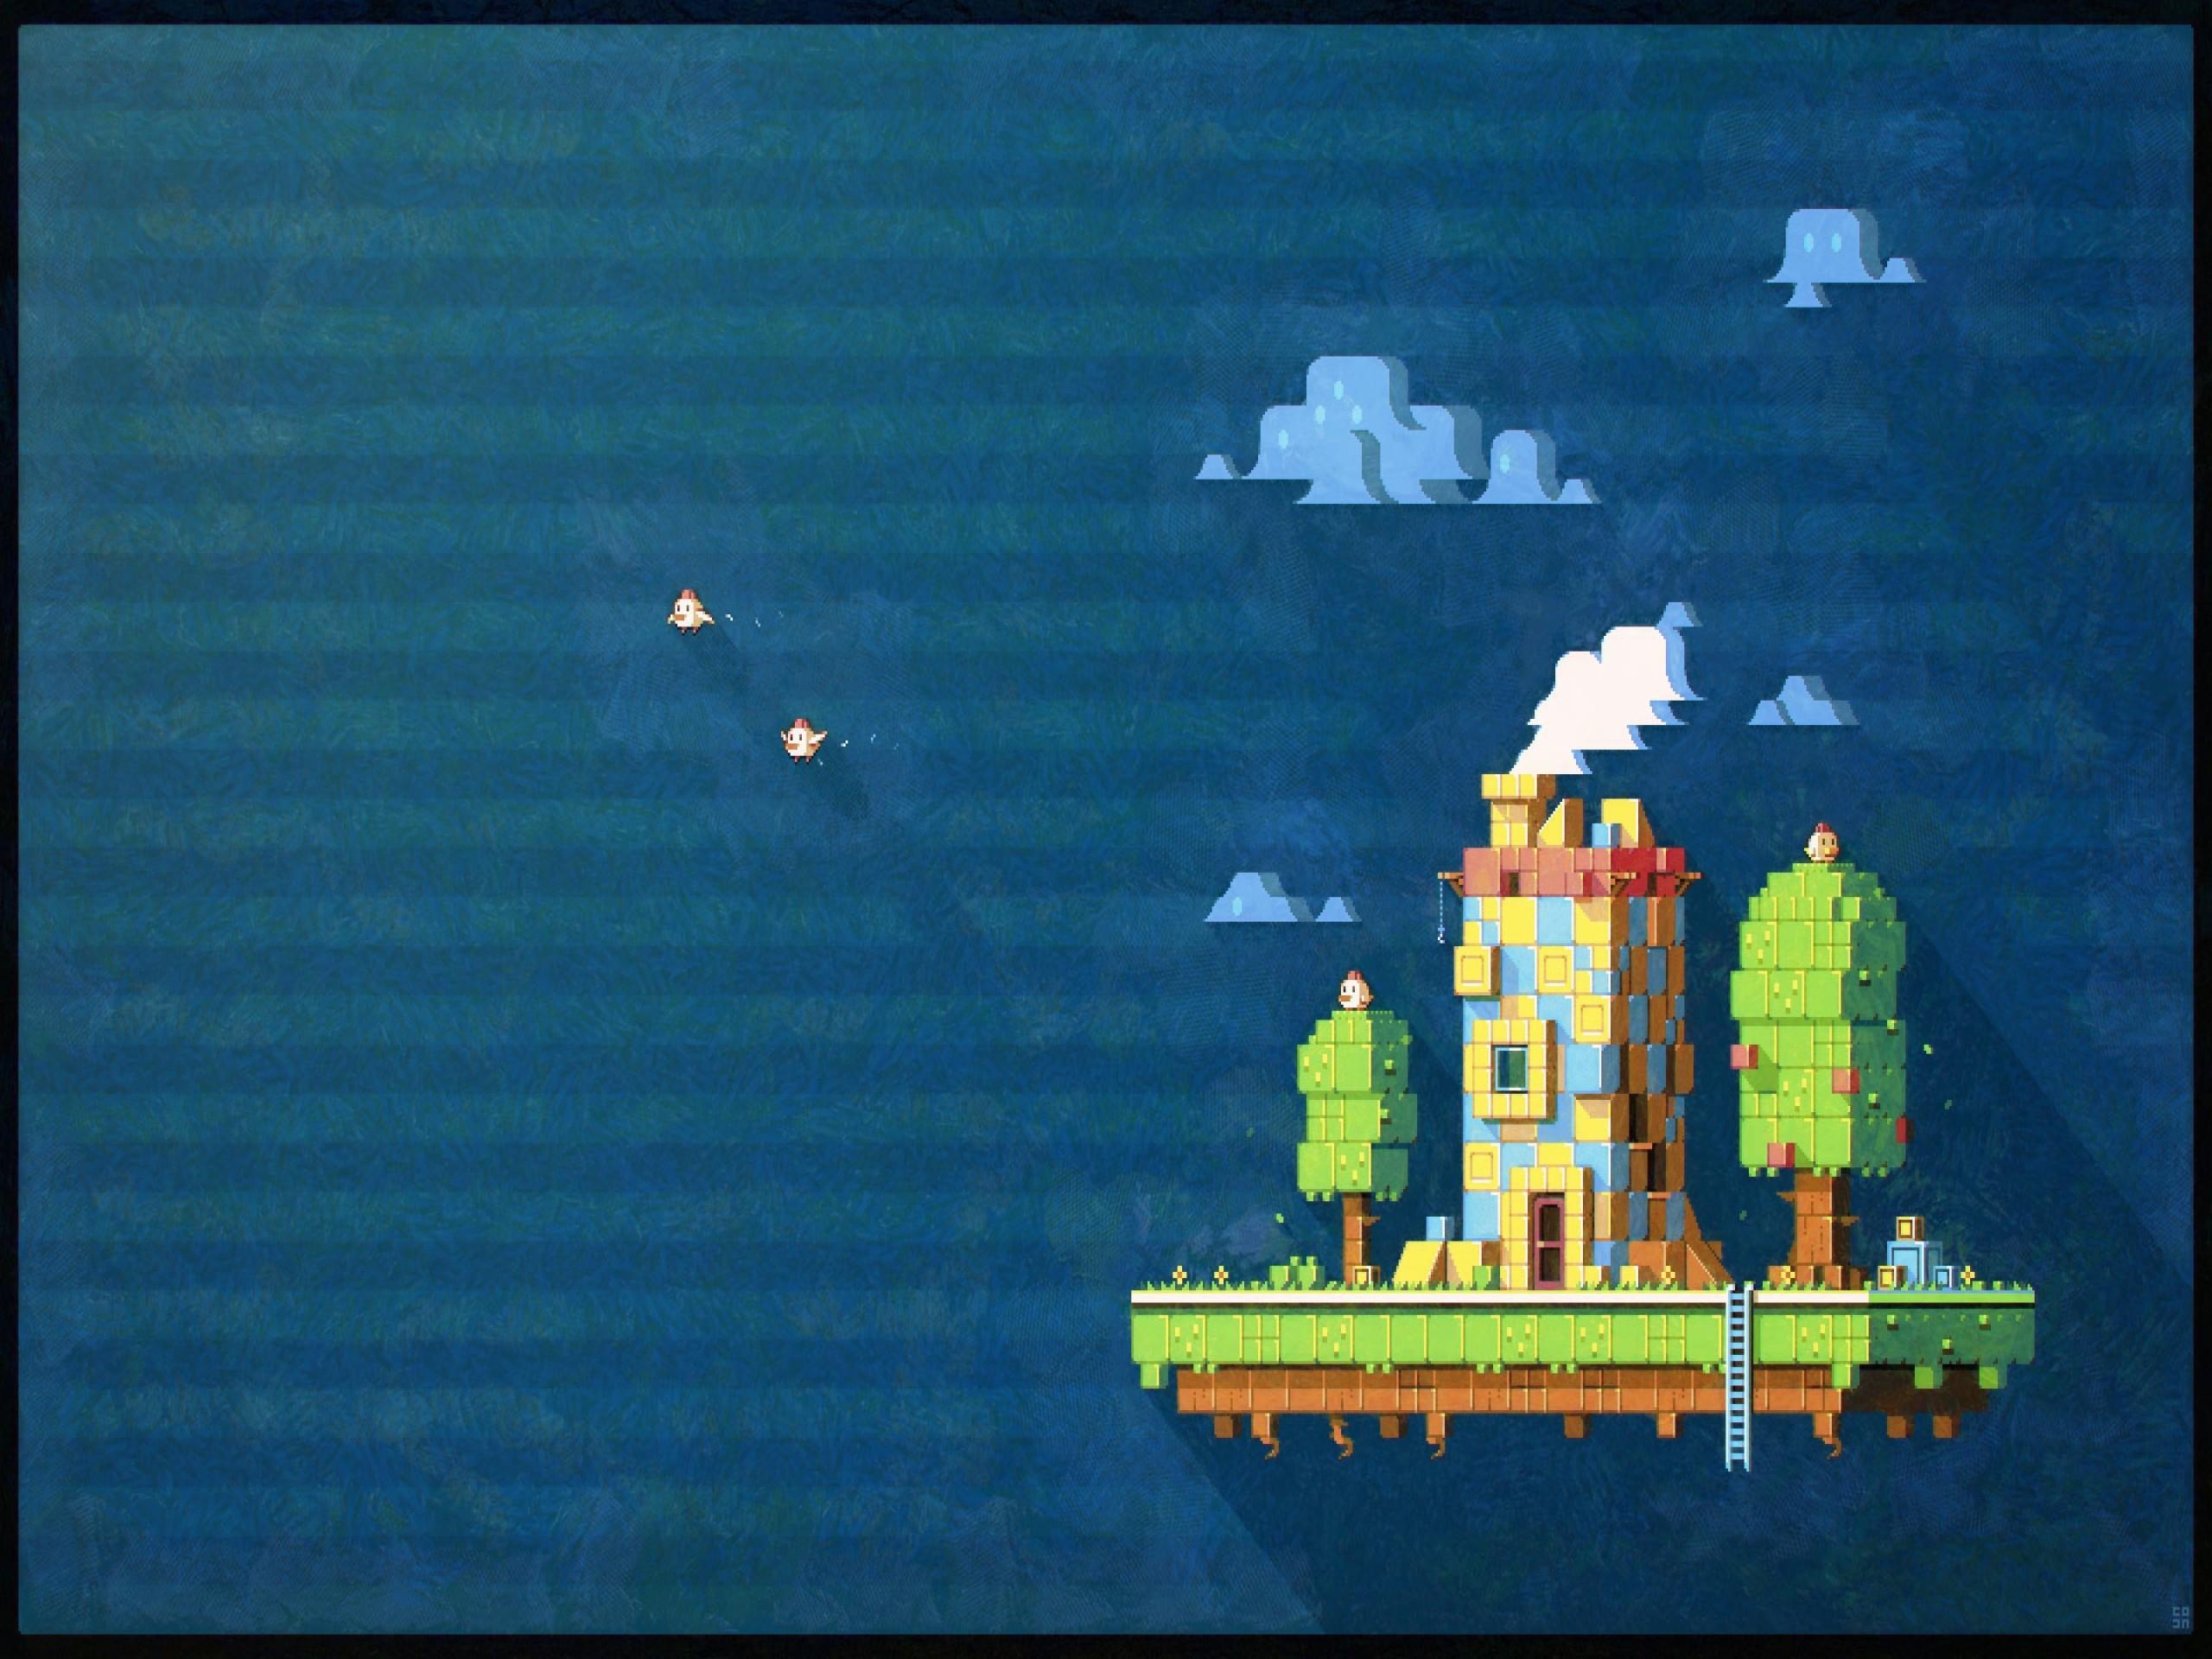 Wallpaper : pixel art, Fez, screenshot, ecosystem ...